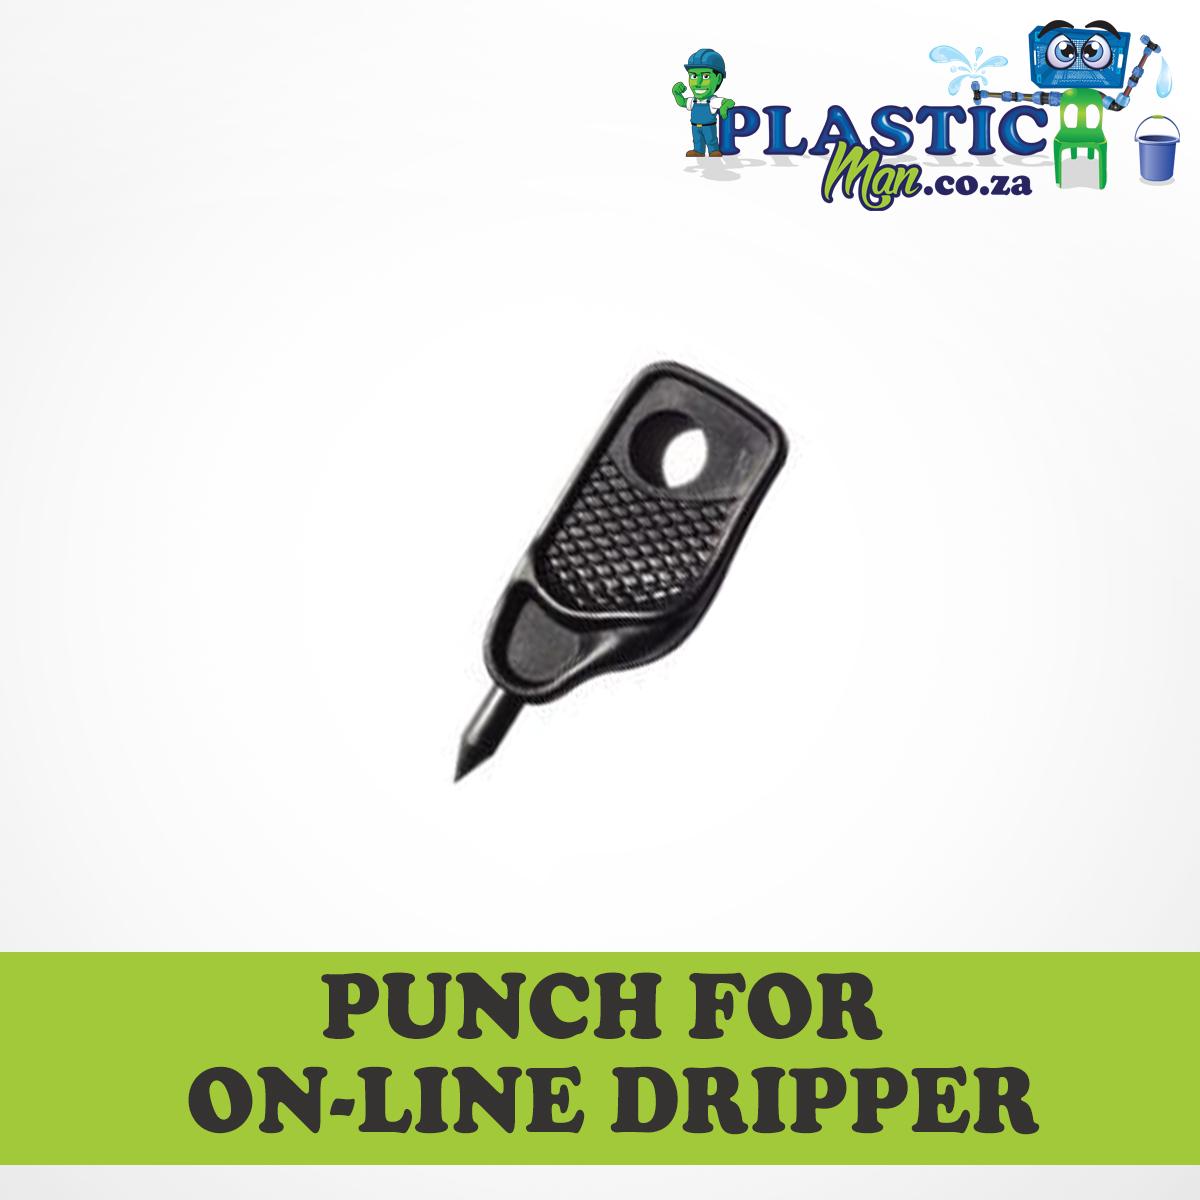 Online Dripper Punch